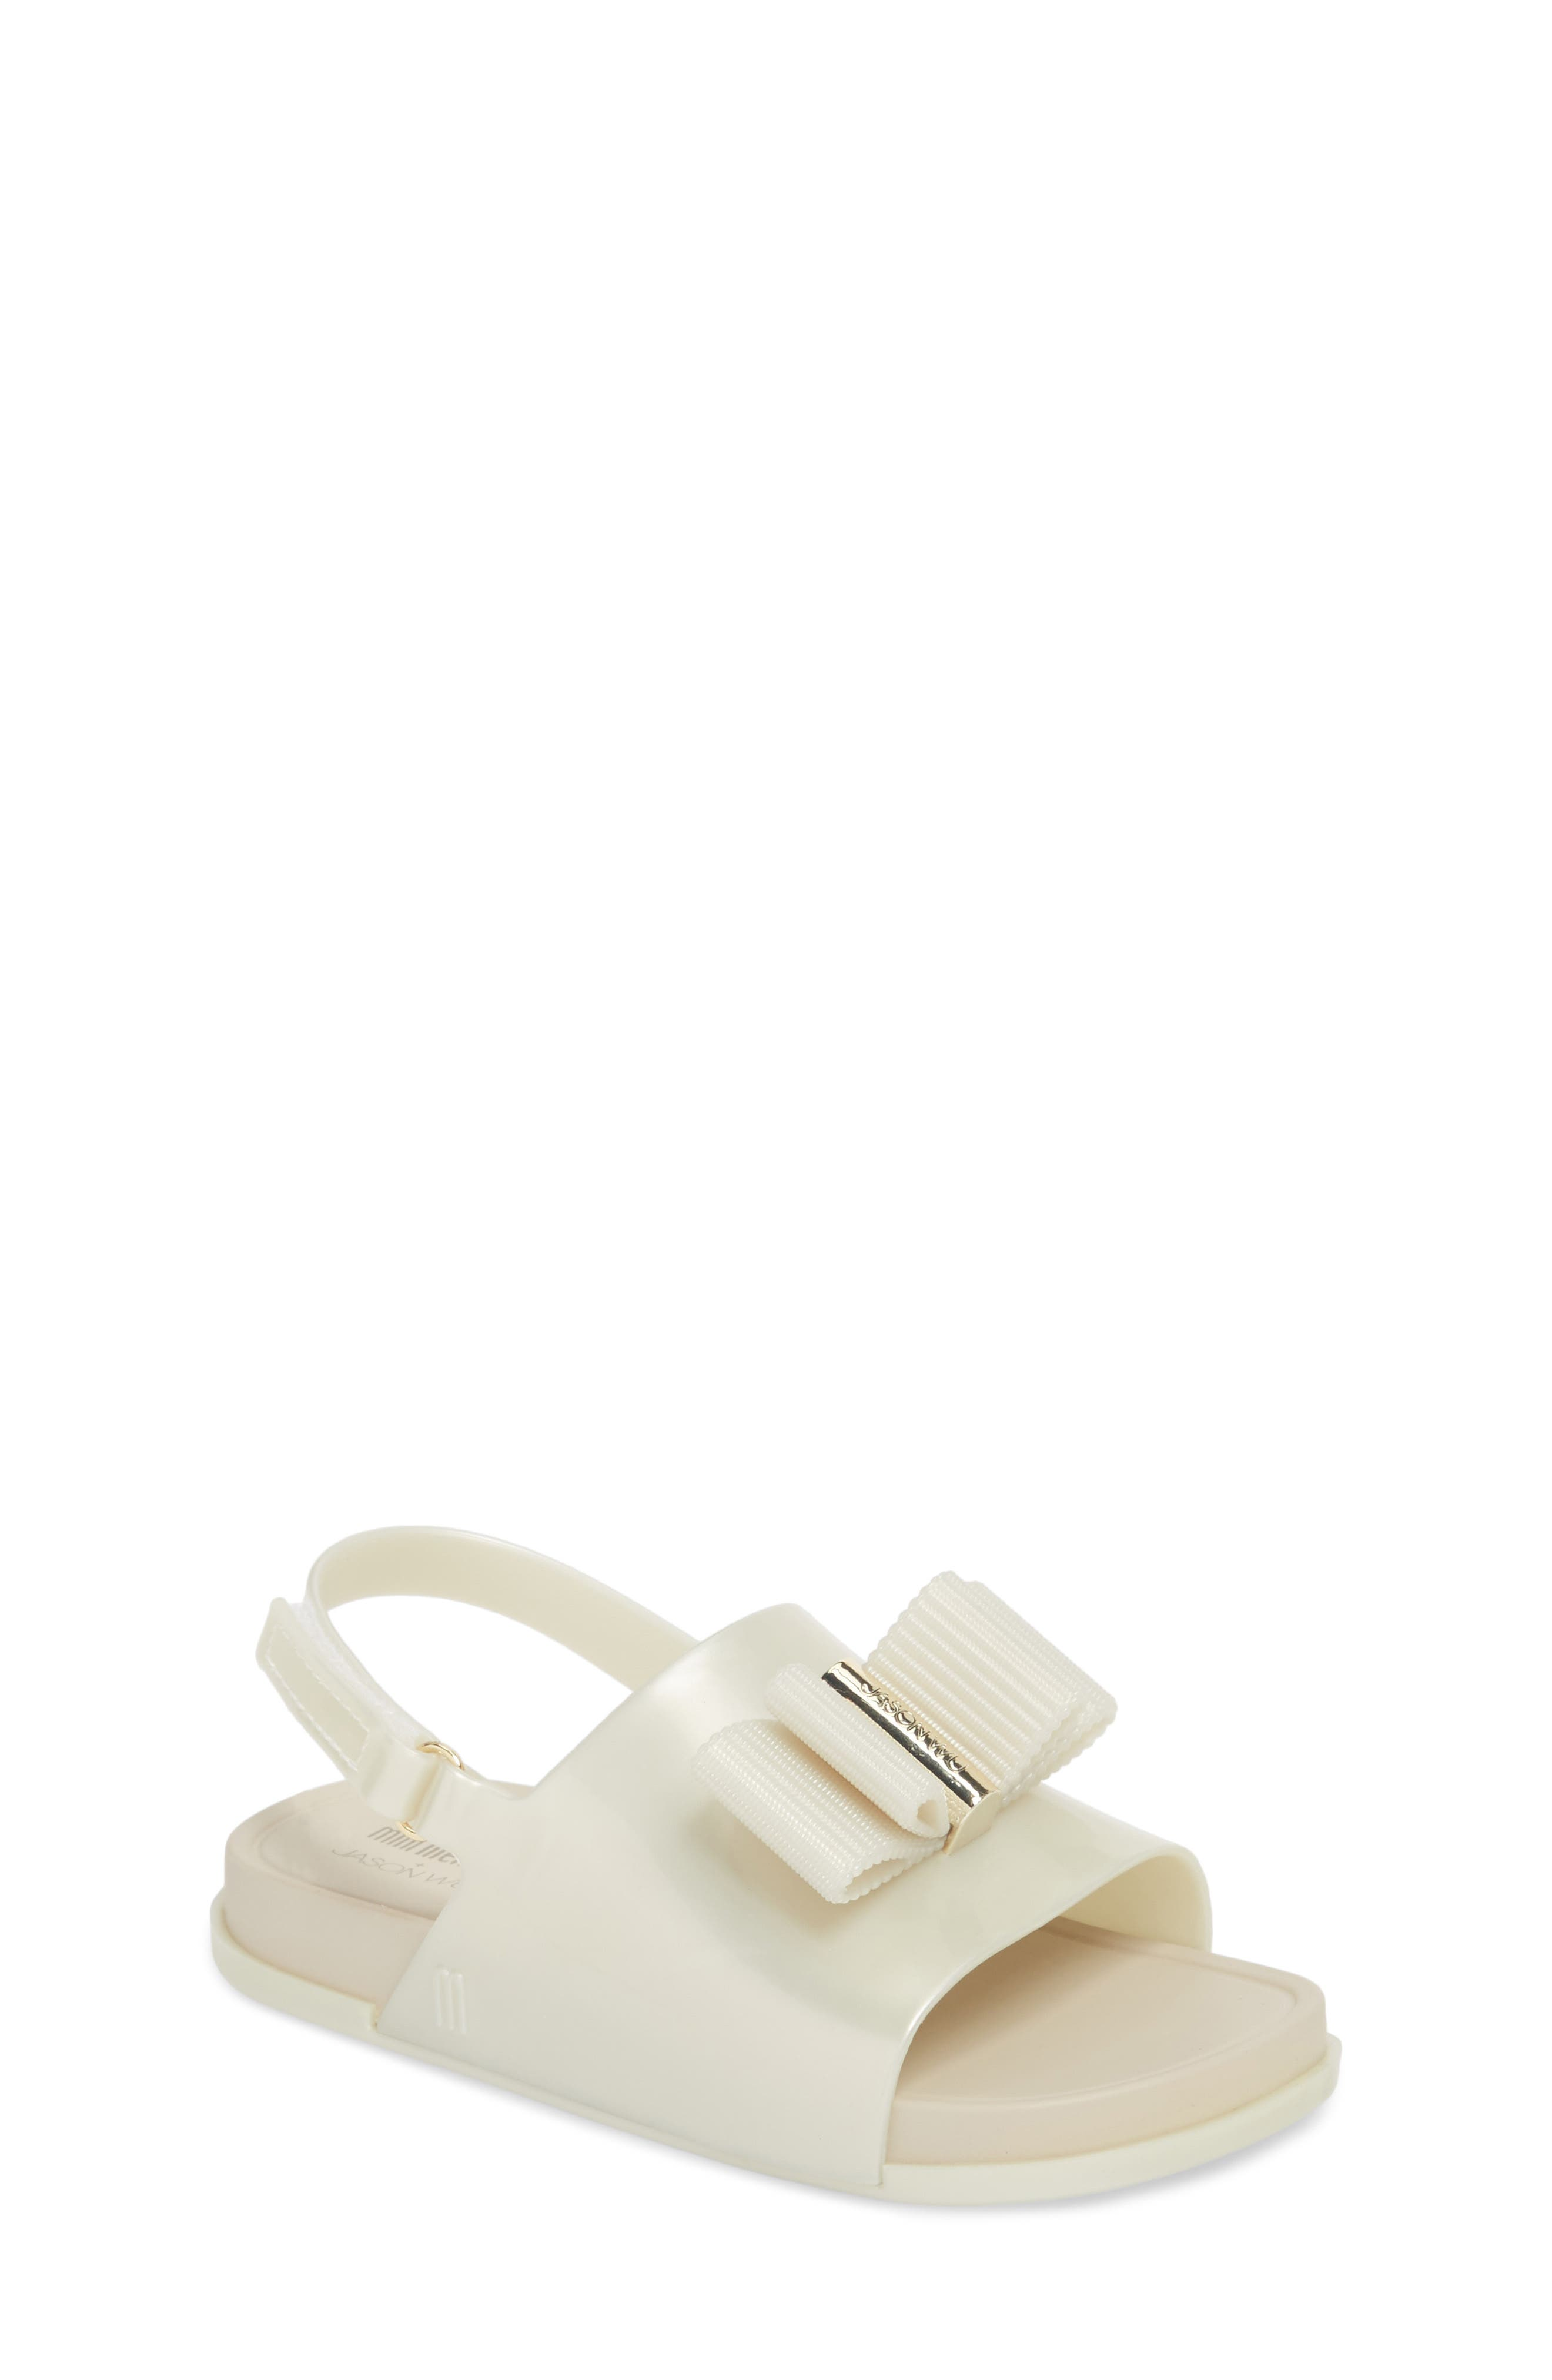 + Jason Wu Mini Beach Slide Sandal,                         Main,                         color, 100